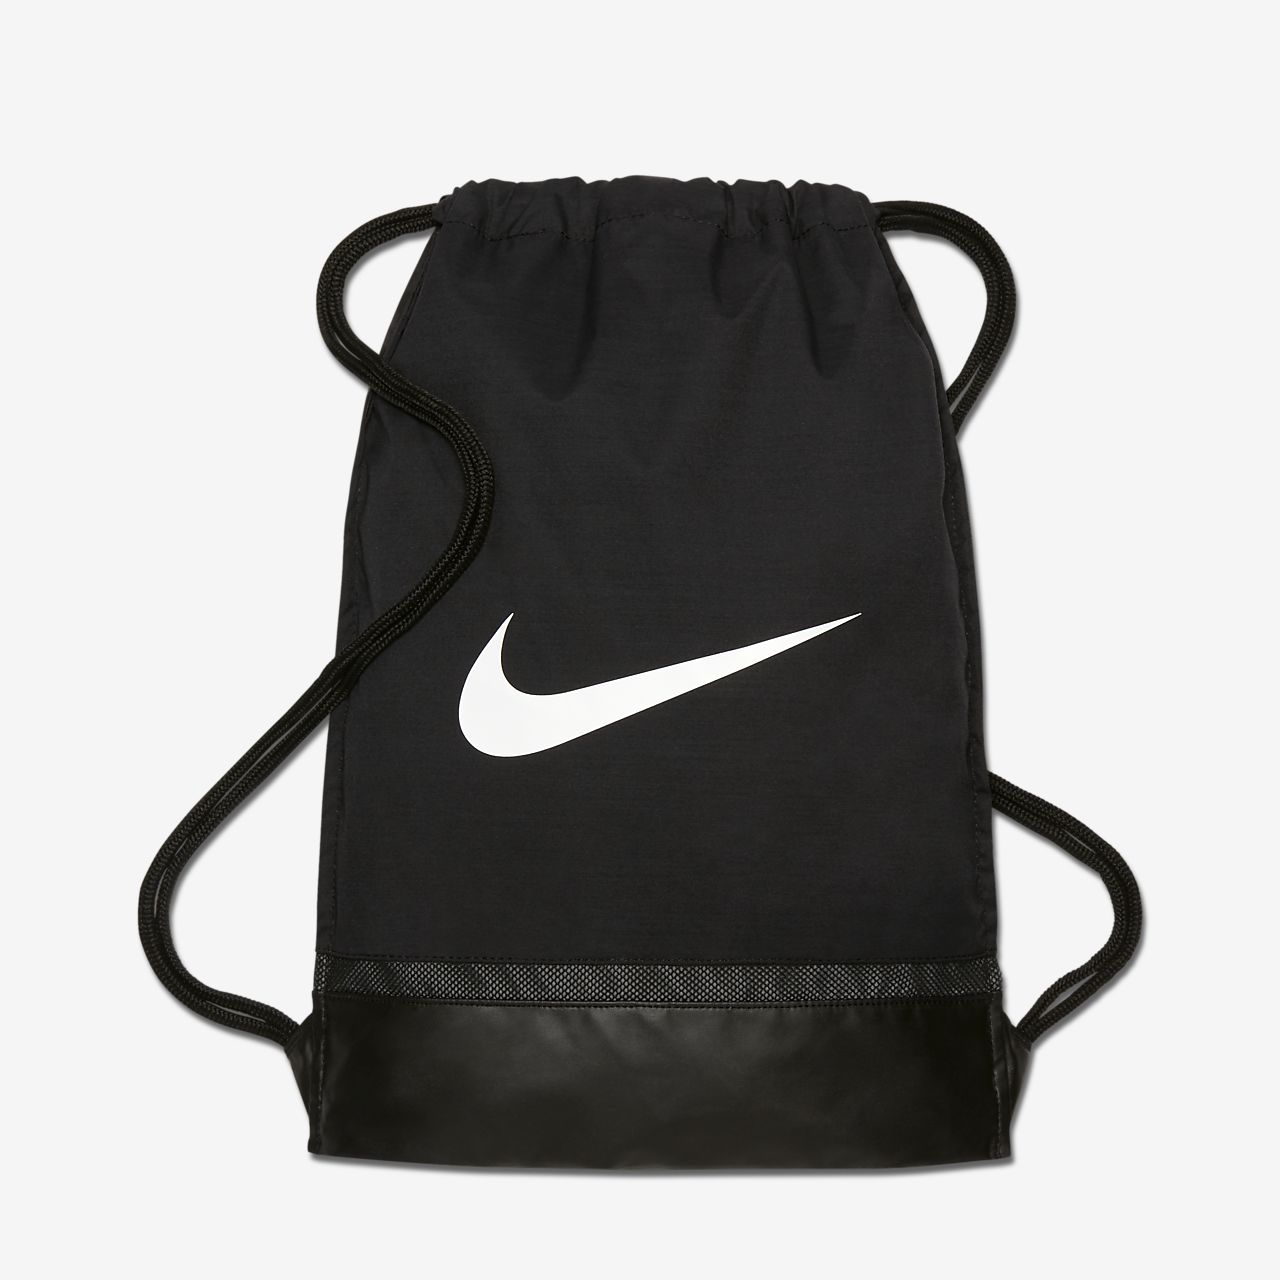 c29986c87f Sac de gym pour l'entraînement Nike Brasilia. Nike.com BE